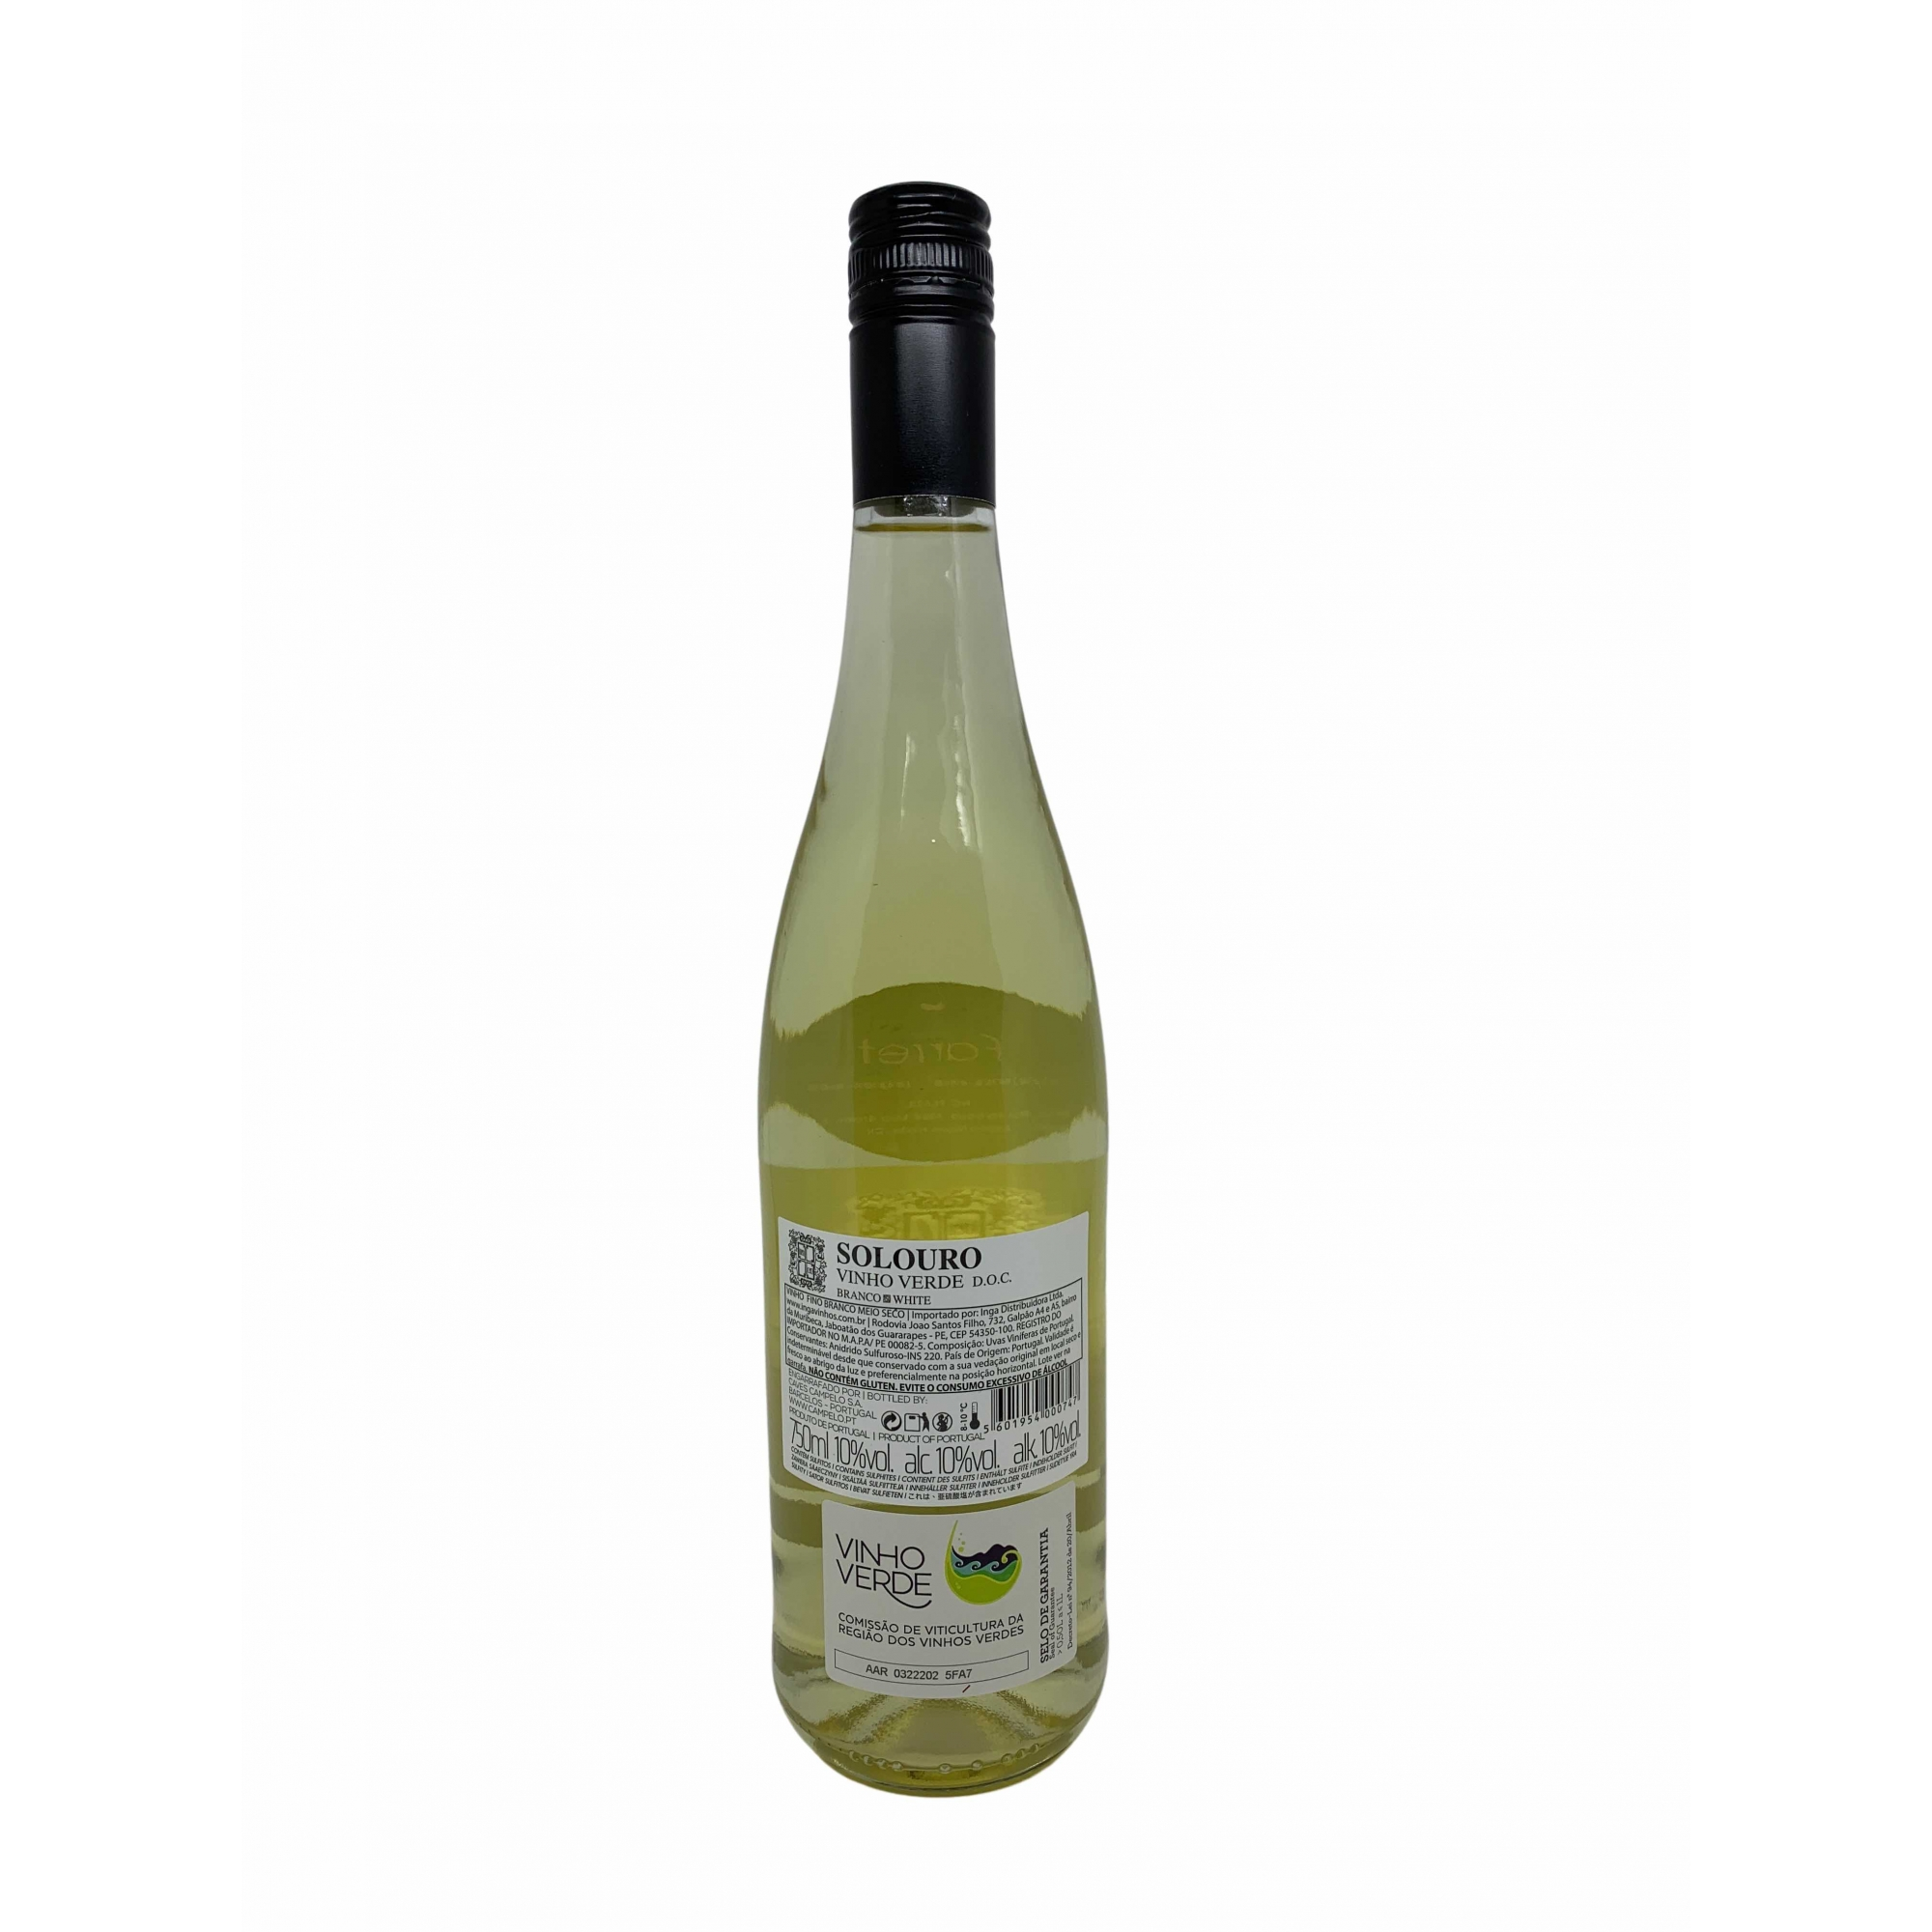 Vinho Verde Solouro DOC 750mL  - ADEGA FARRET